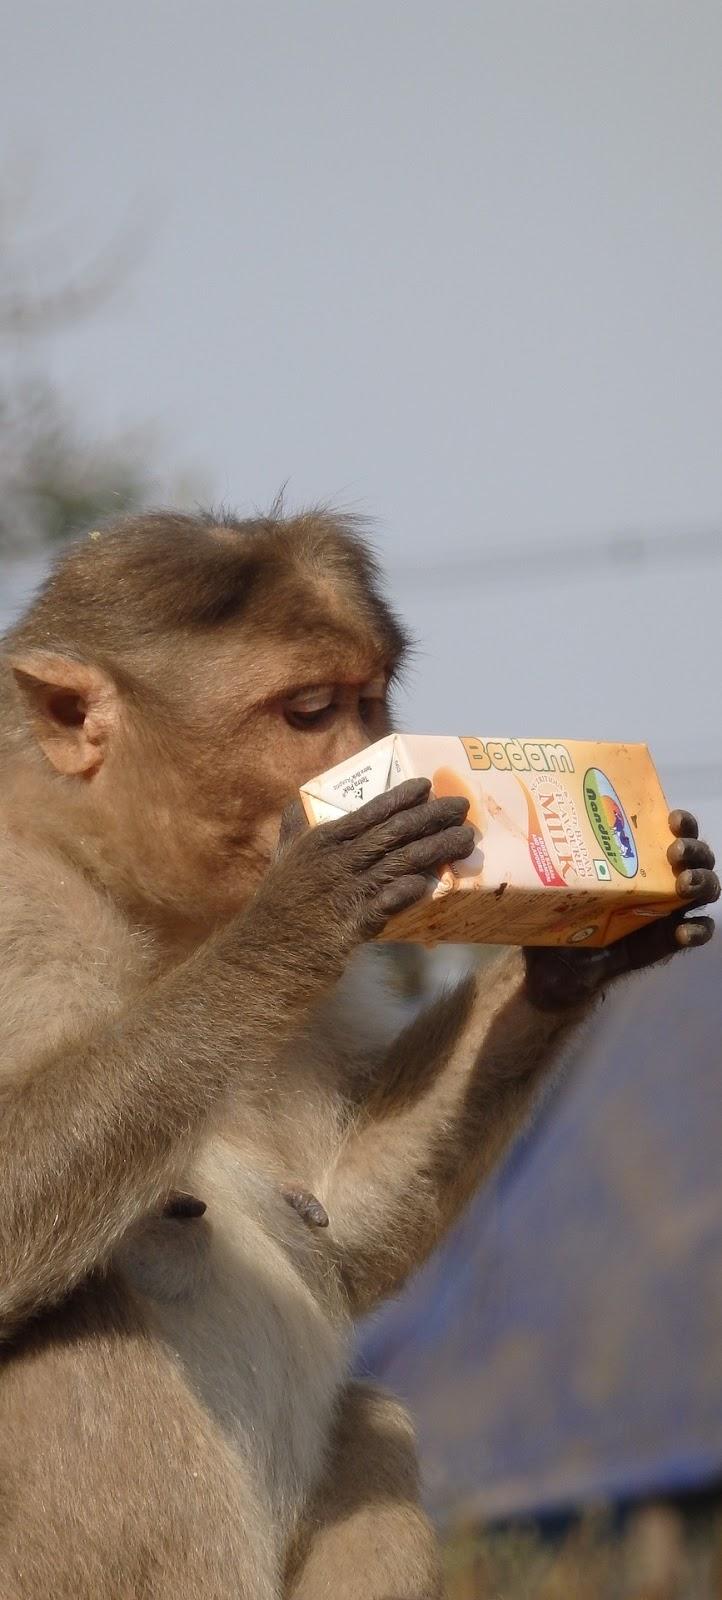 A monkey's taste of modernity.